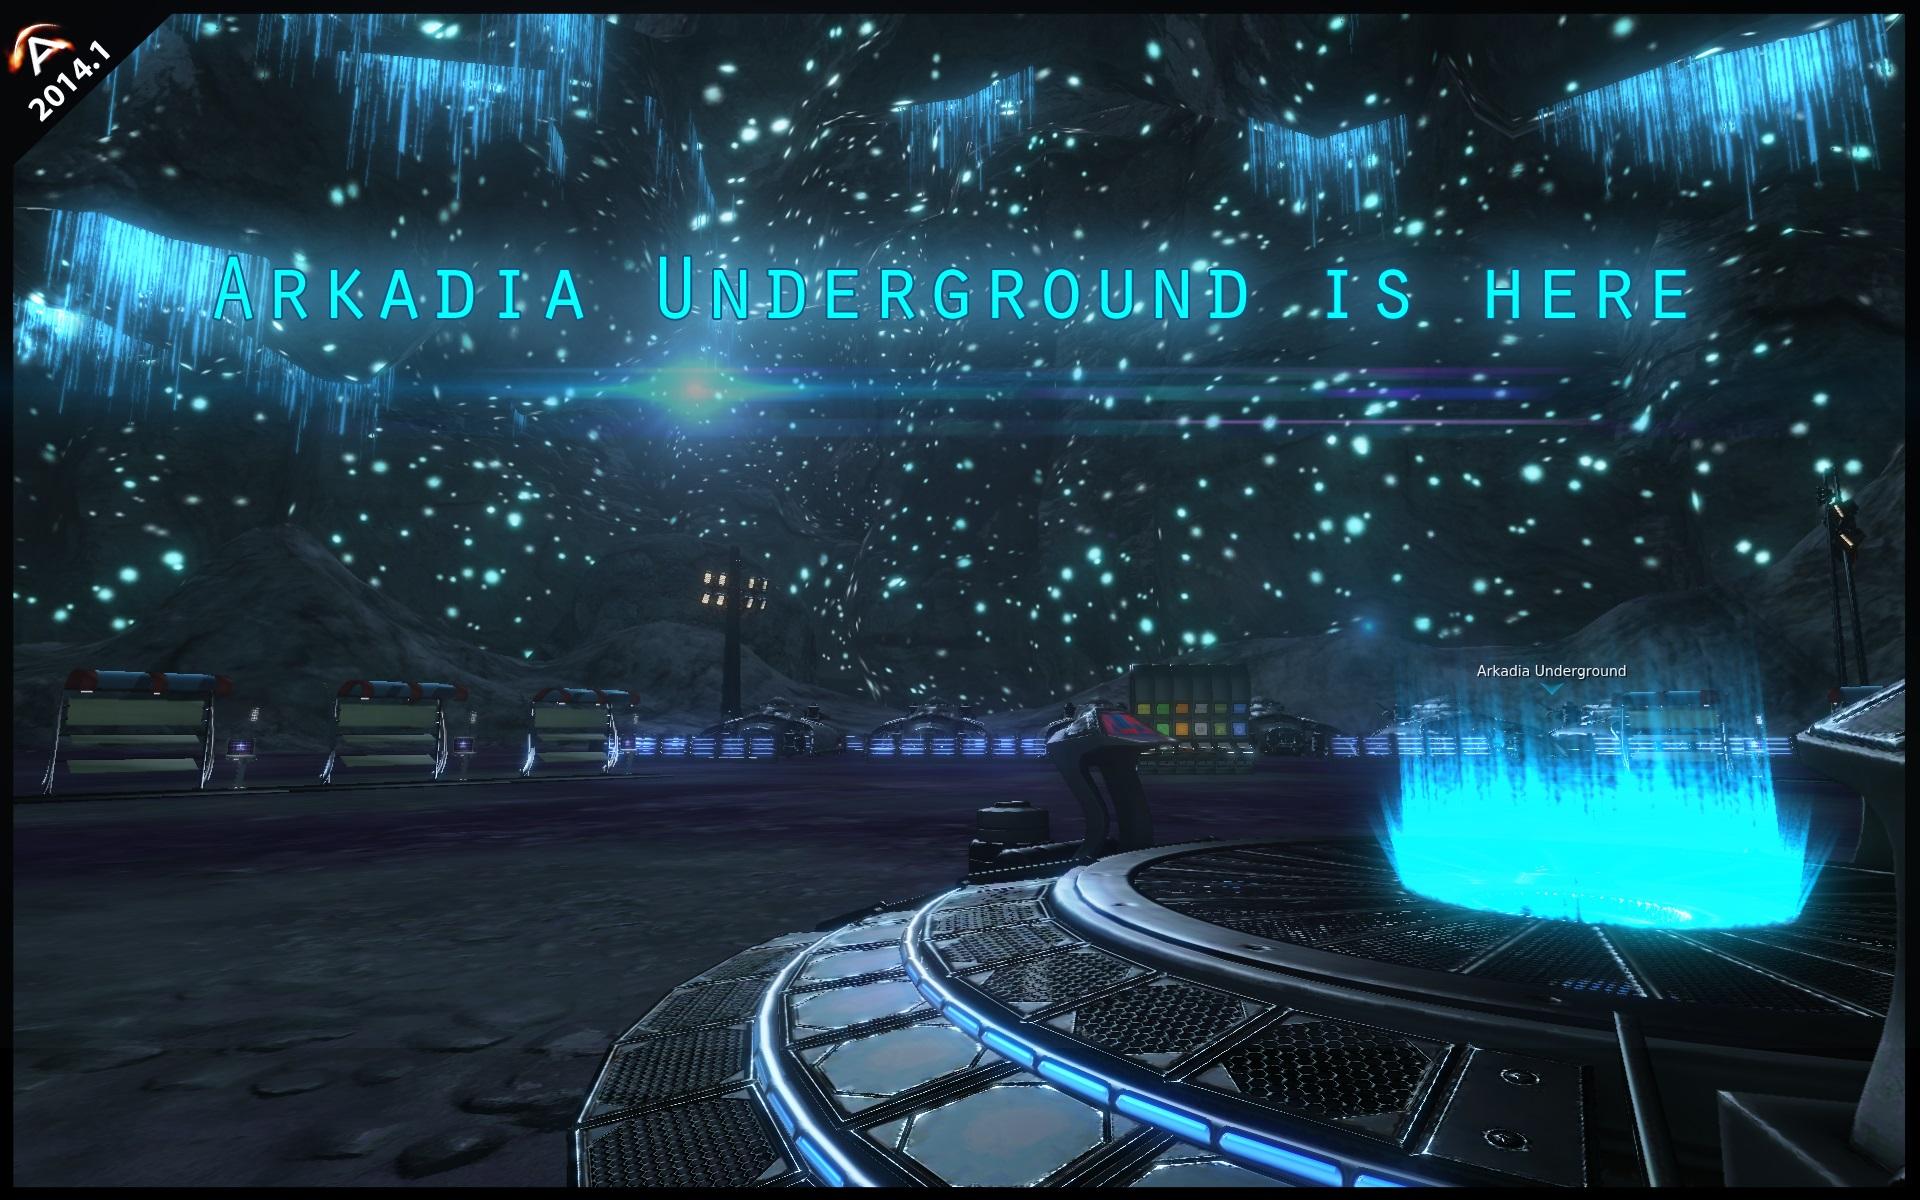 Arkadia-Underground-Teleporter-image